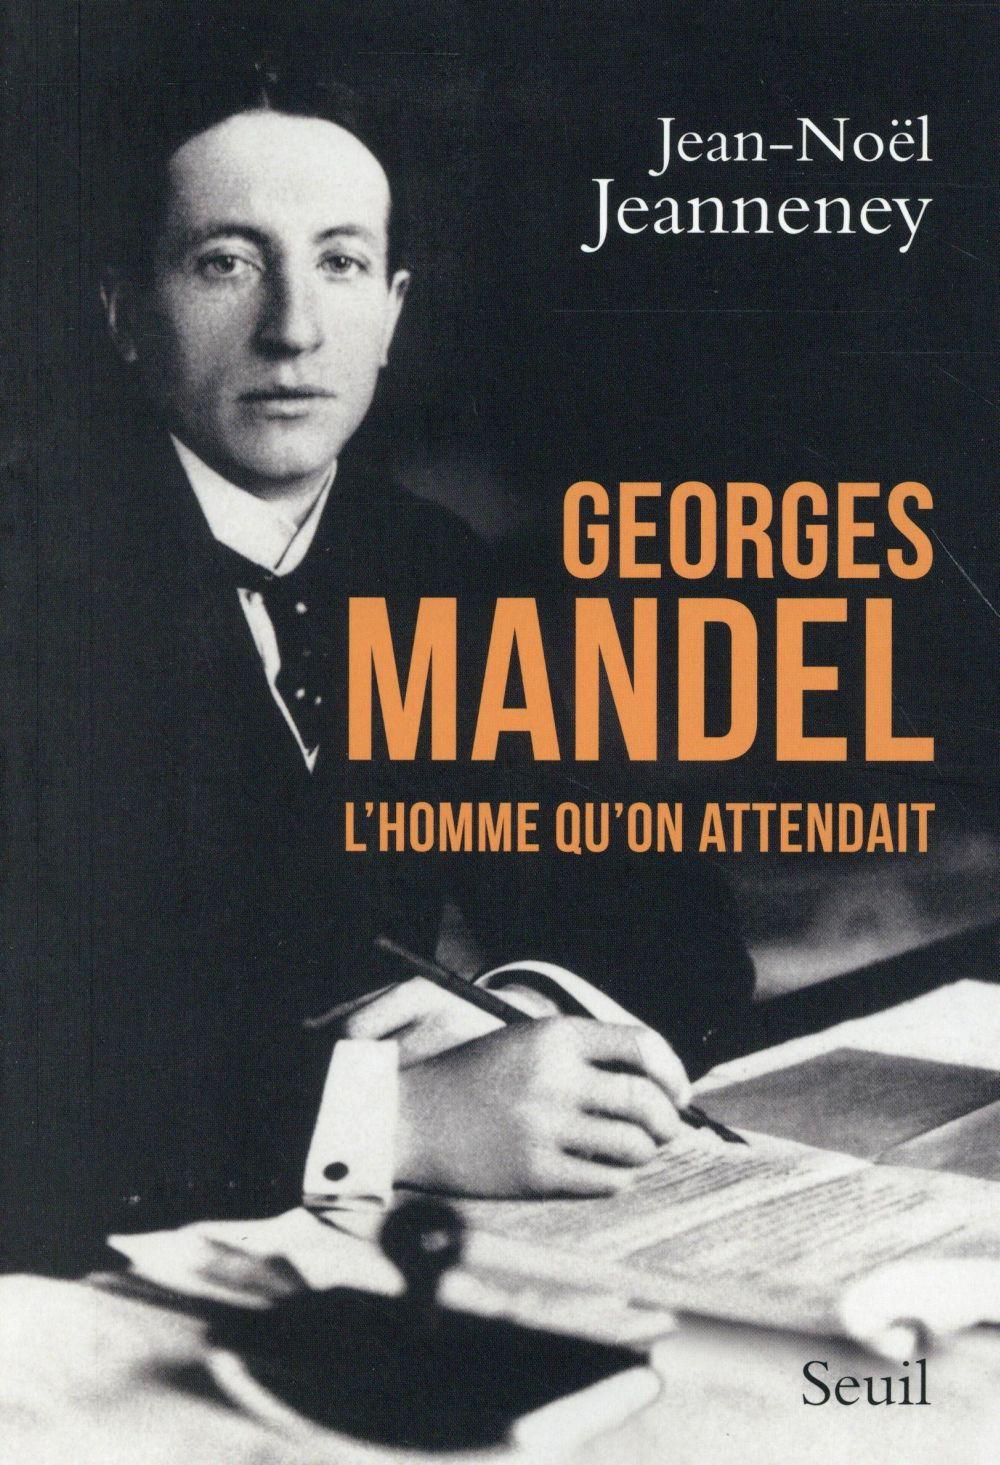 Georges Mandel, l'homme qu'on attendait